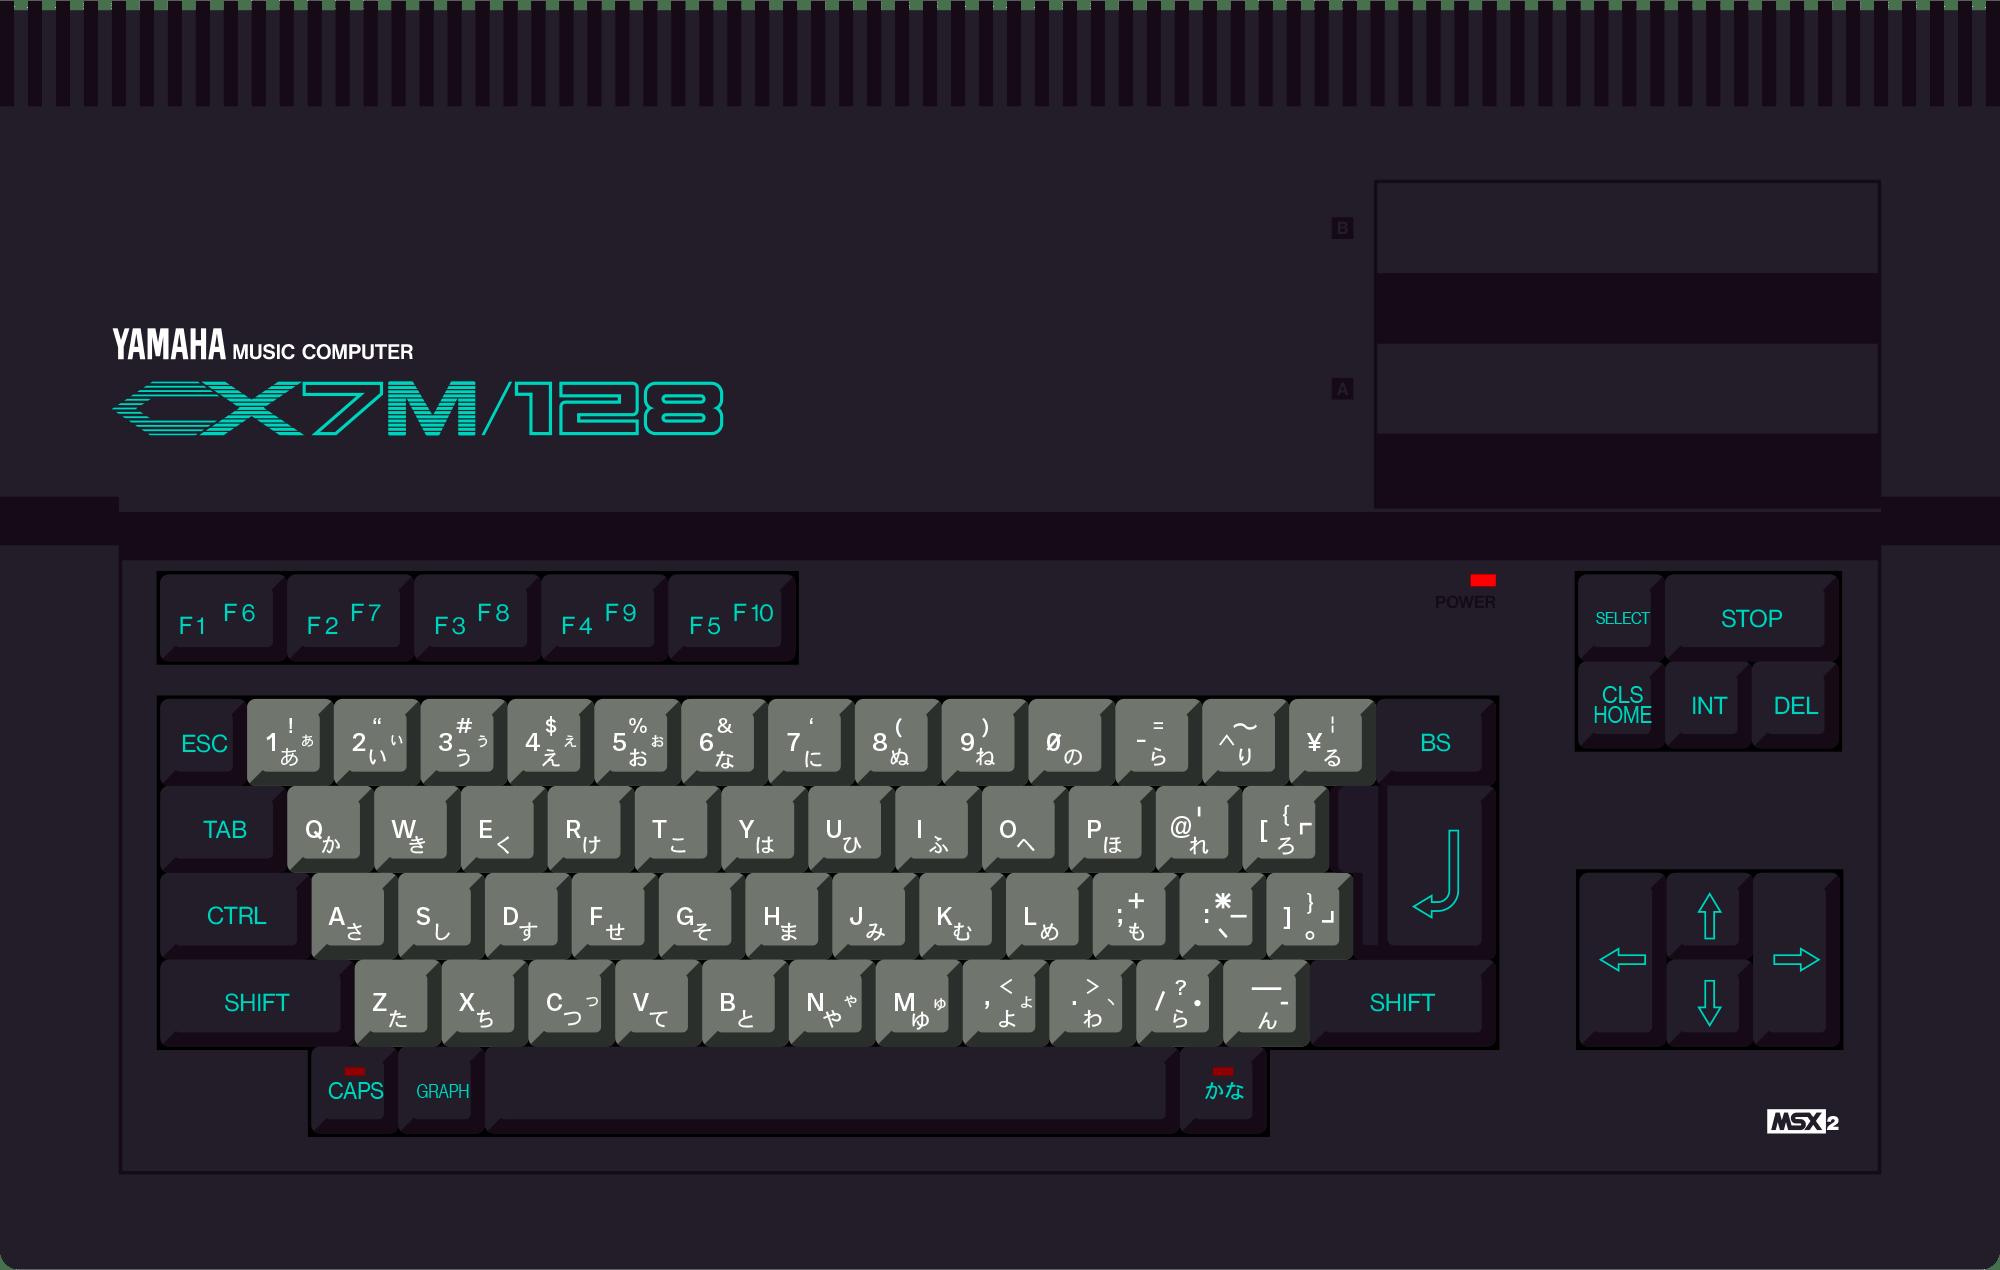 Yamaha CX7M/128 MSX2 computer